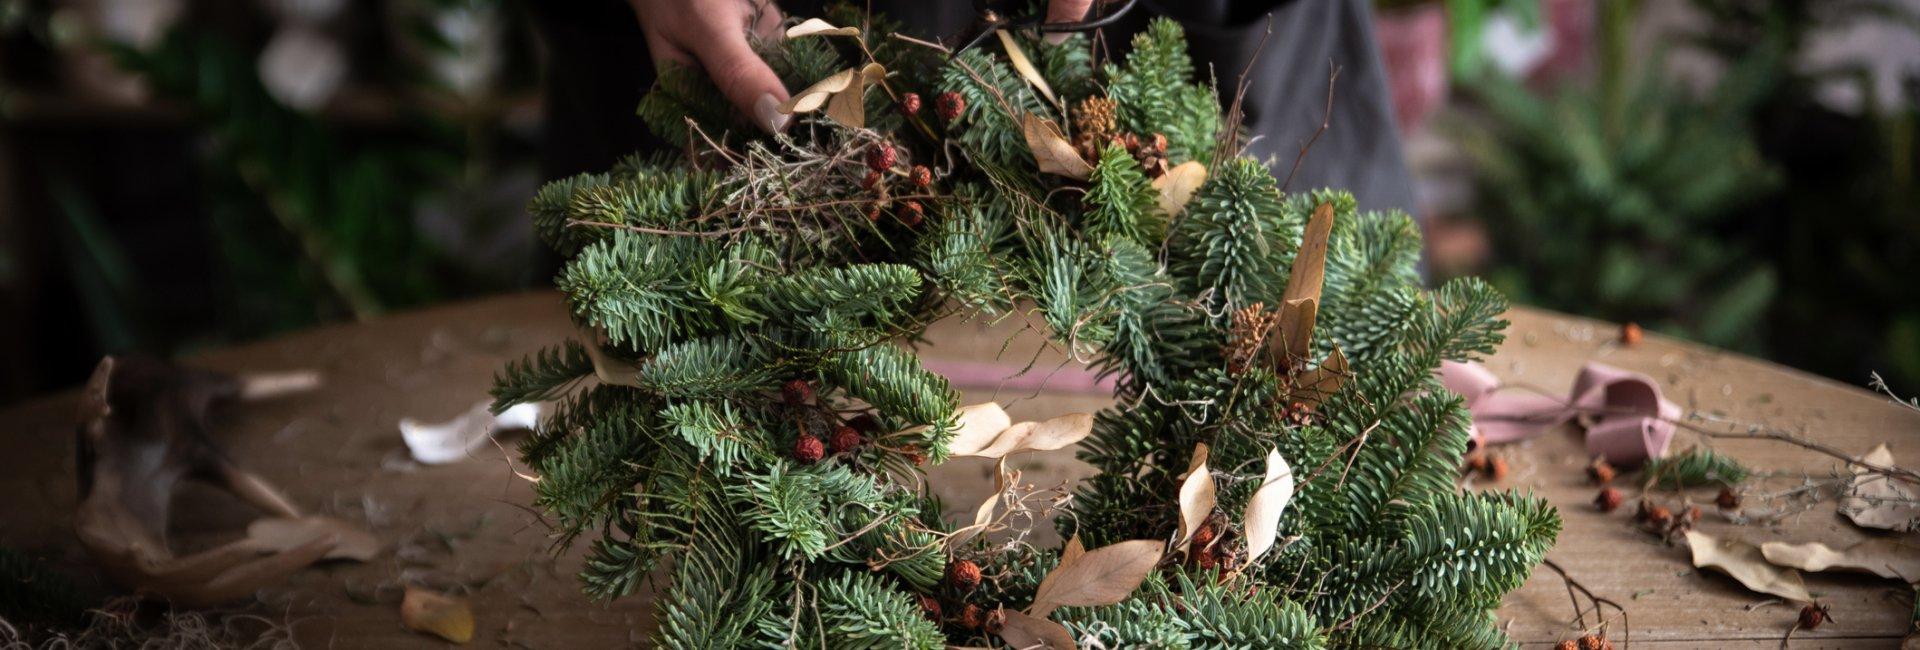 virtual wreath making